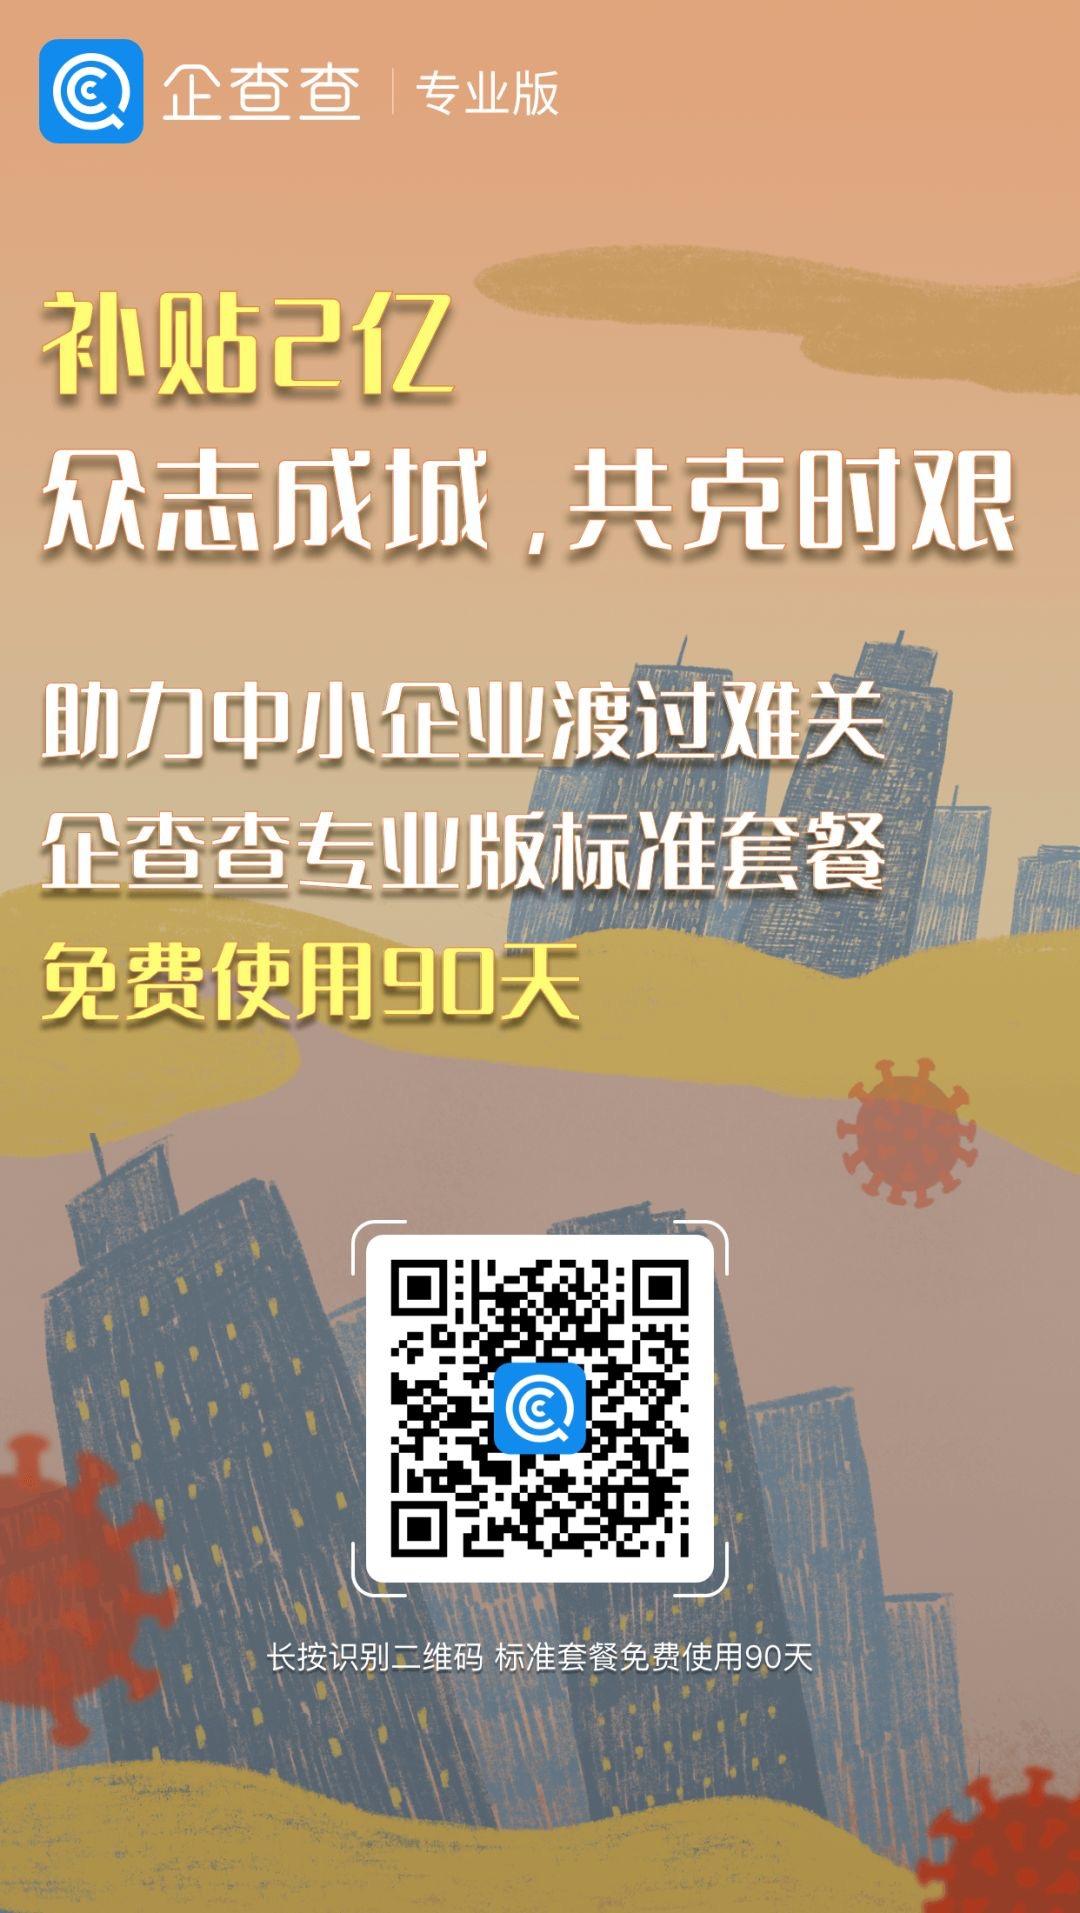 651581498627_.pic_hd.jpg